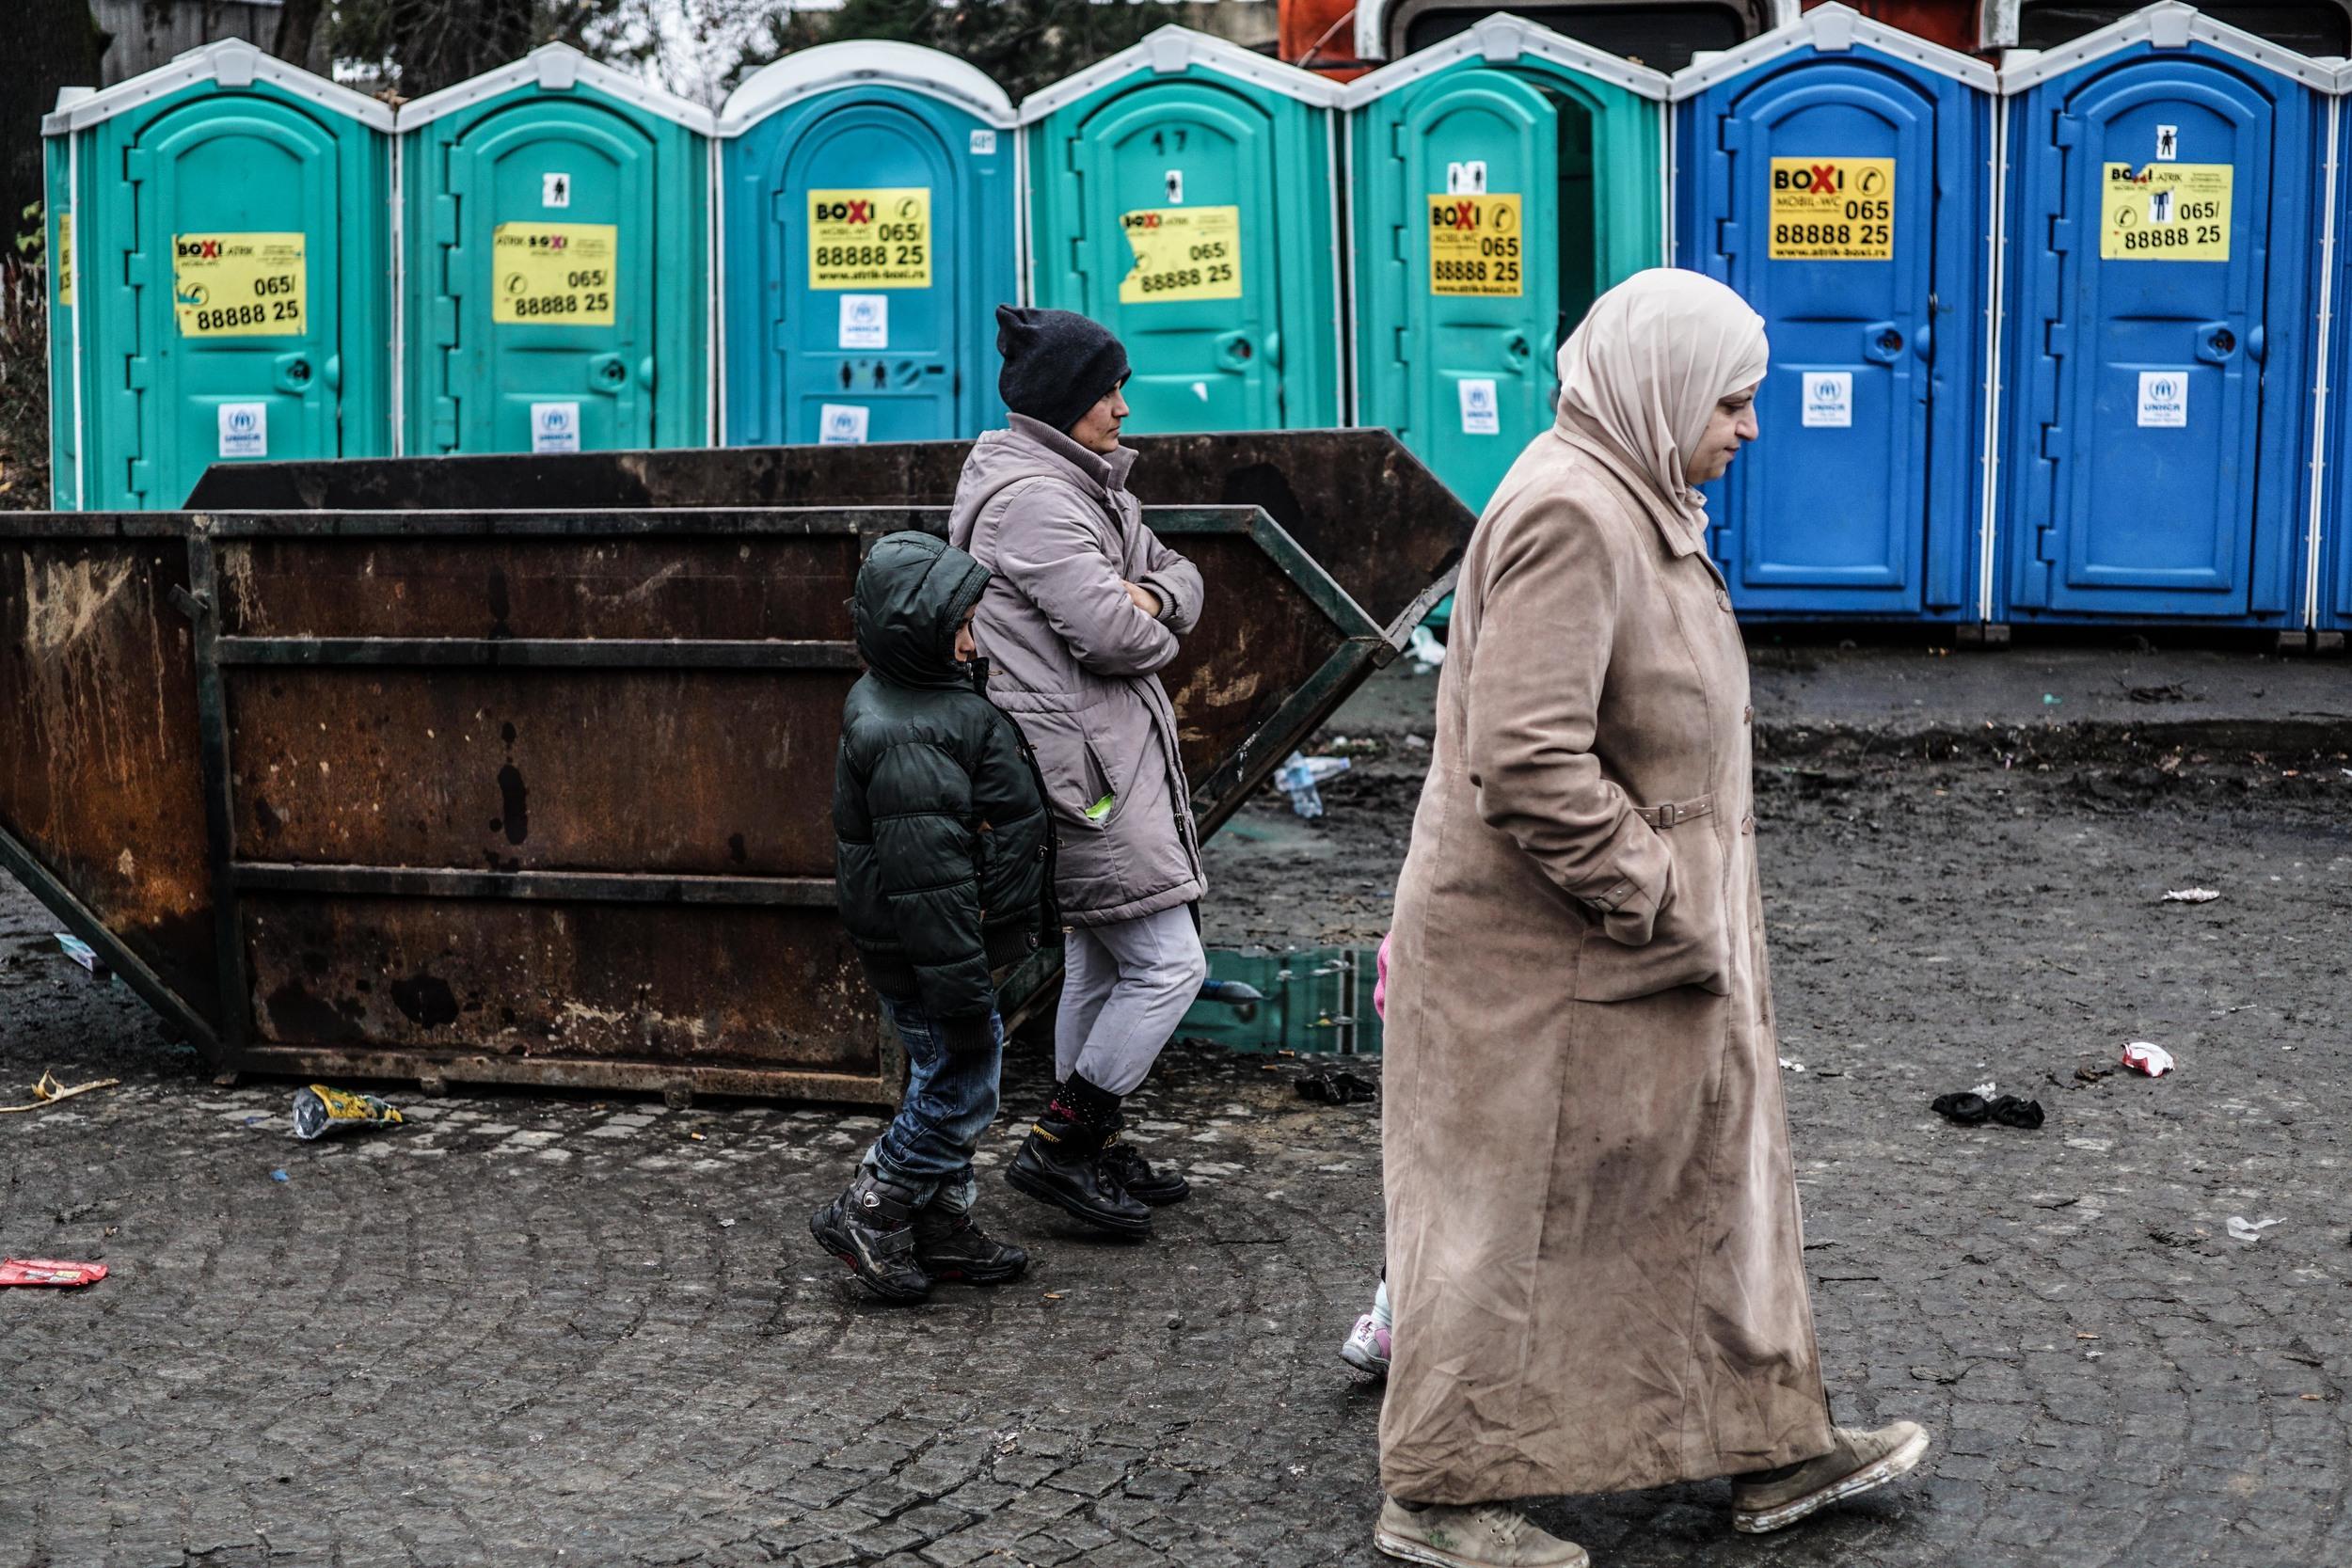 Syrian Refugee Crisis Serbia November 2015 4.jpg